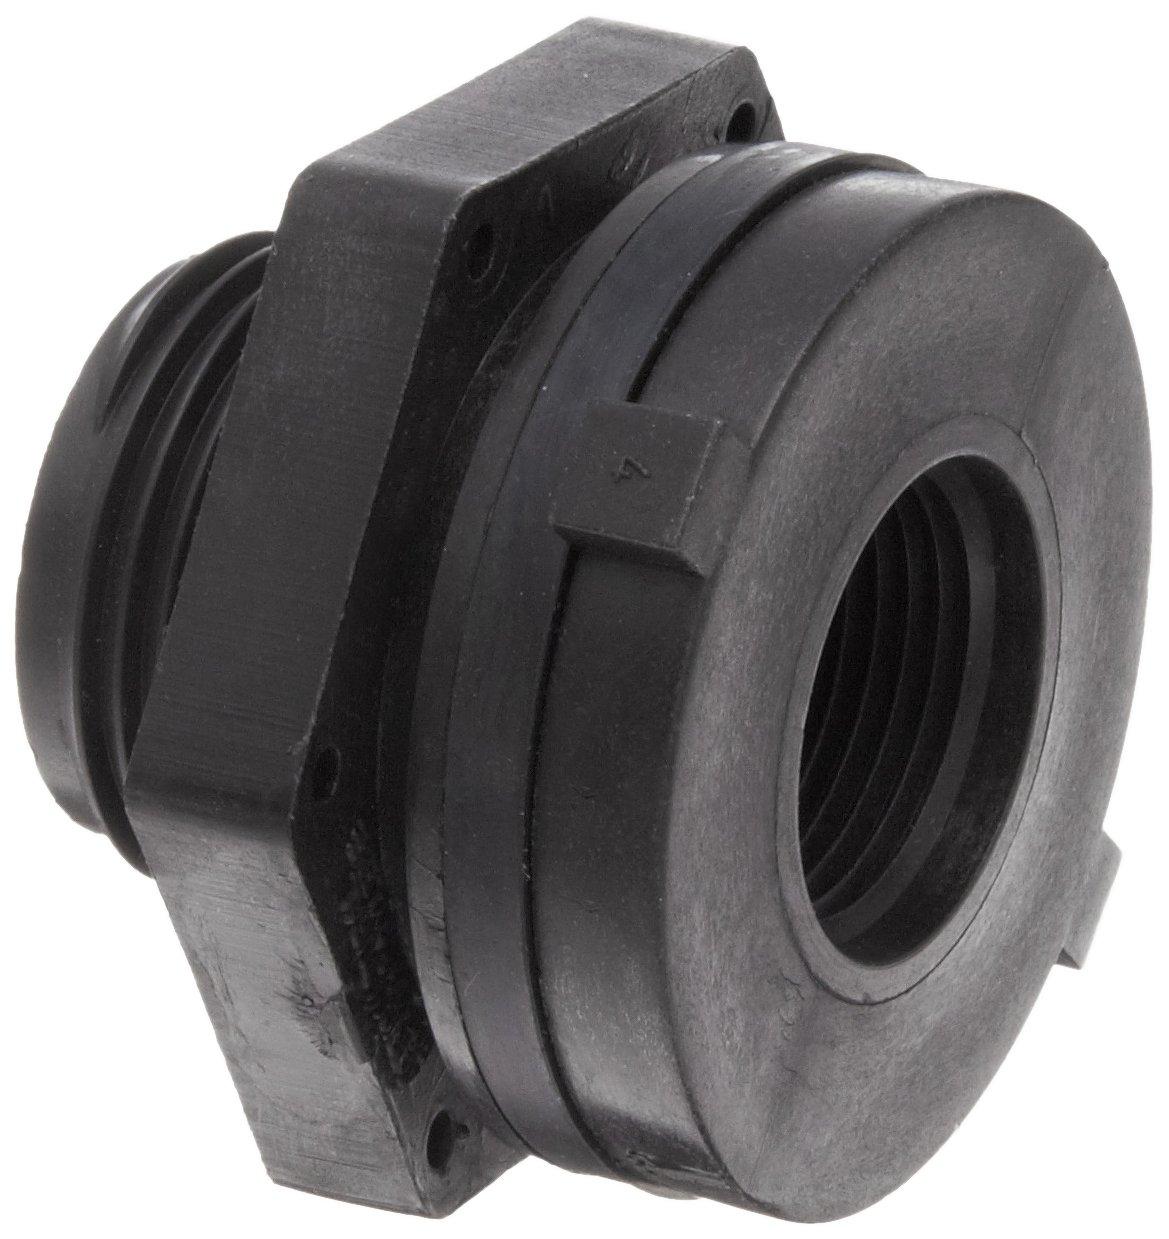 Dixon 60405 Polypropylene Pipe and Welding Fitting Bulkhead 2 NPT Female 3 Hole Size